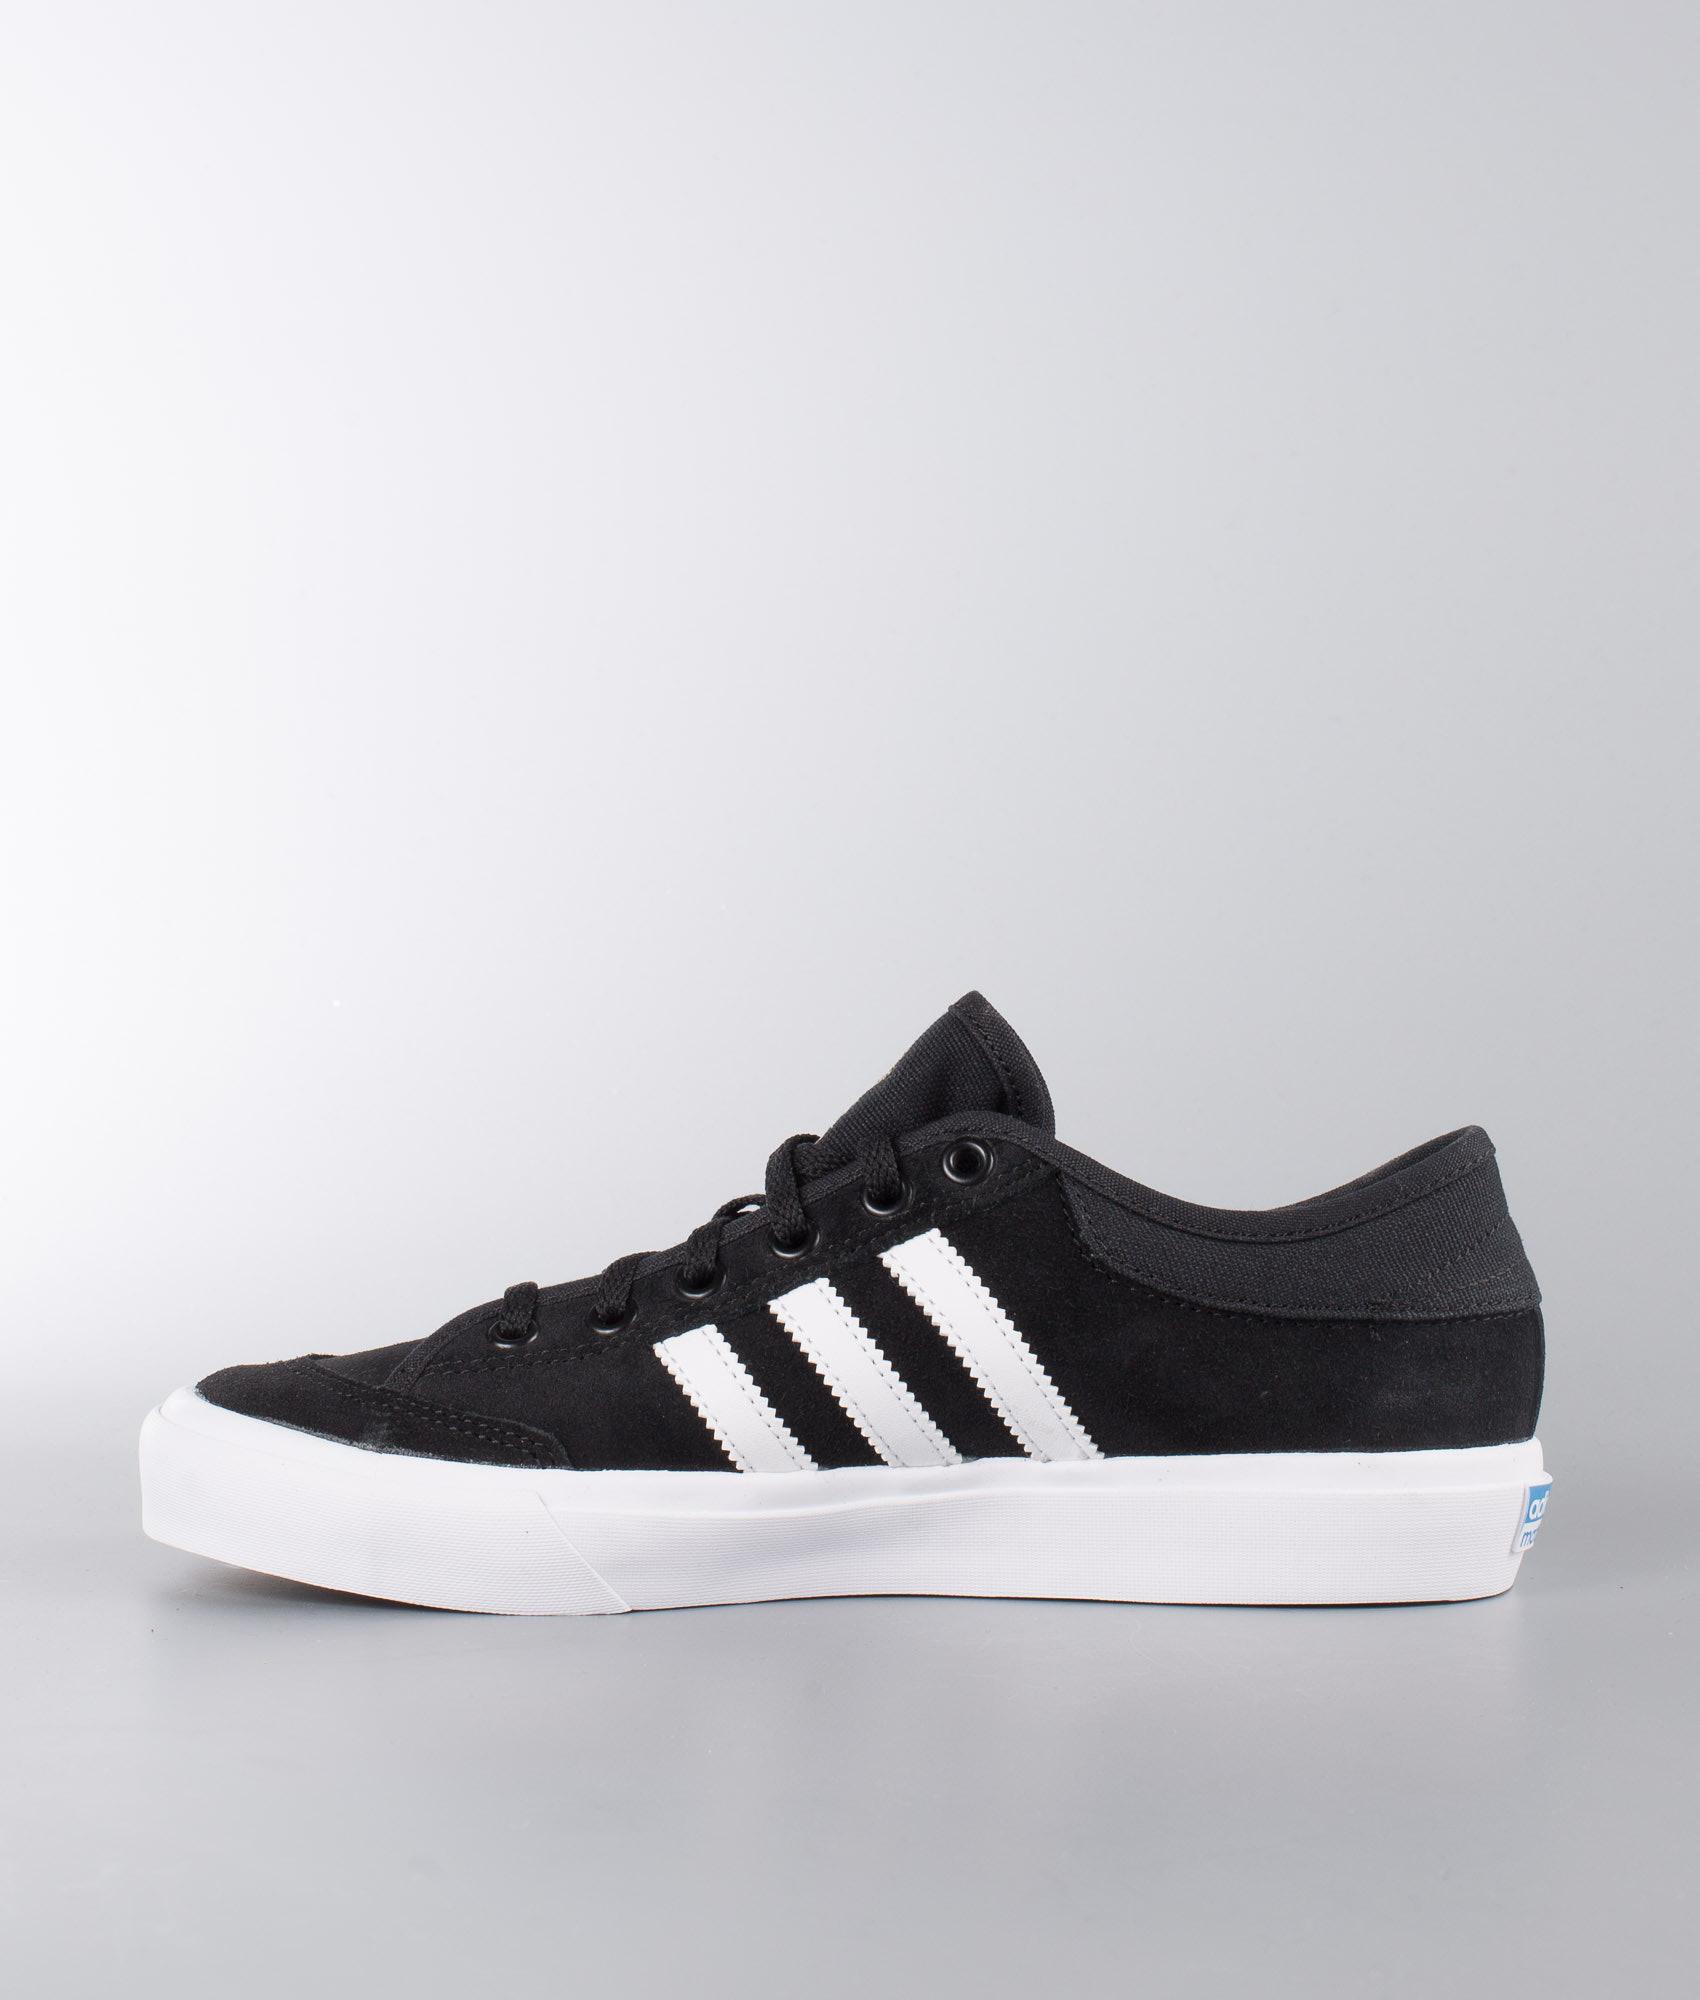 8a22c3be7124 Adidas Skateboarding Matchcourt Shoes Core Black Ftwr White Ftwr ...